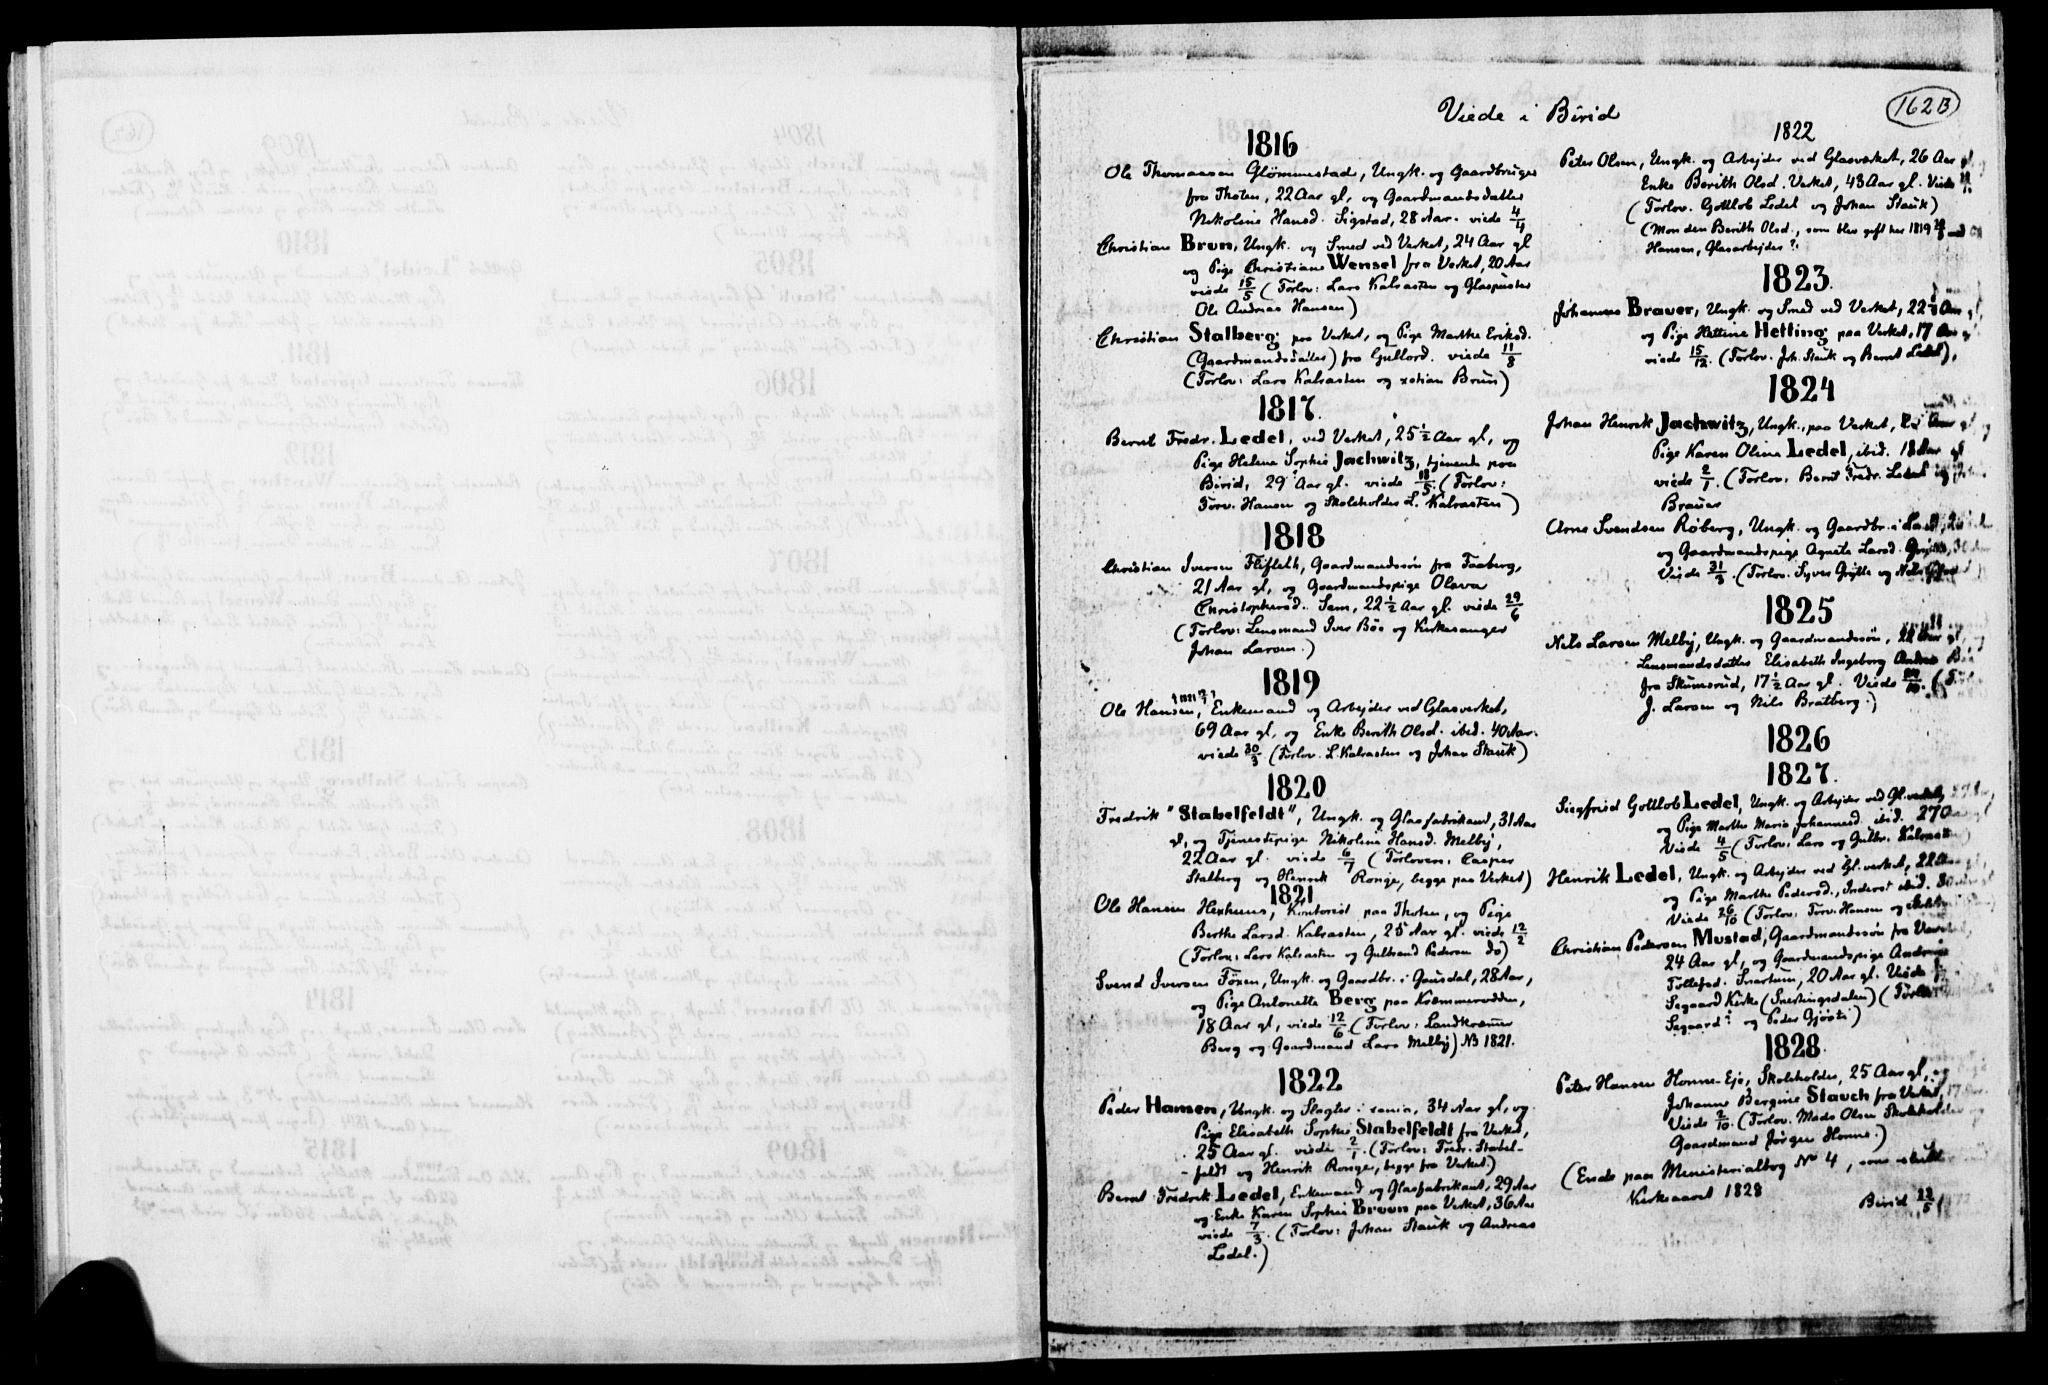 SAH, Biri prestekontor, Ministerialbok, 1730-1879, s. 162b